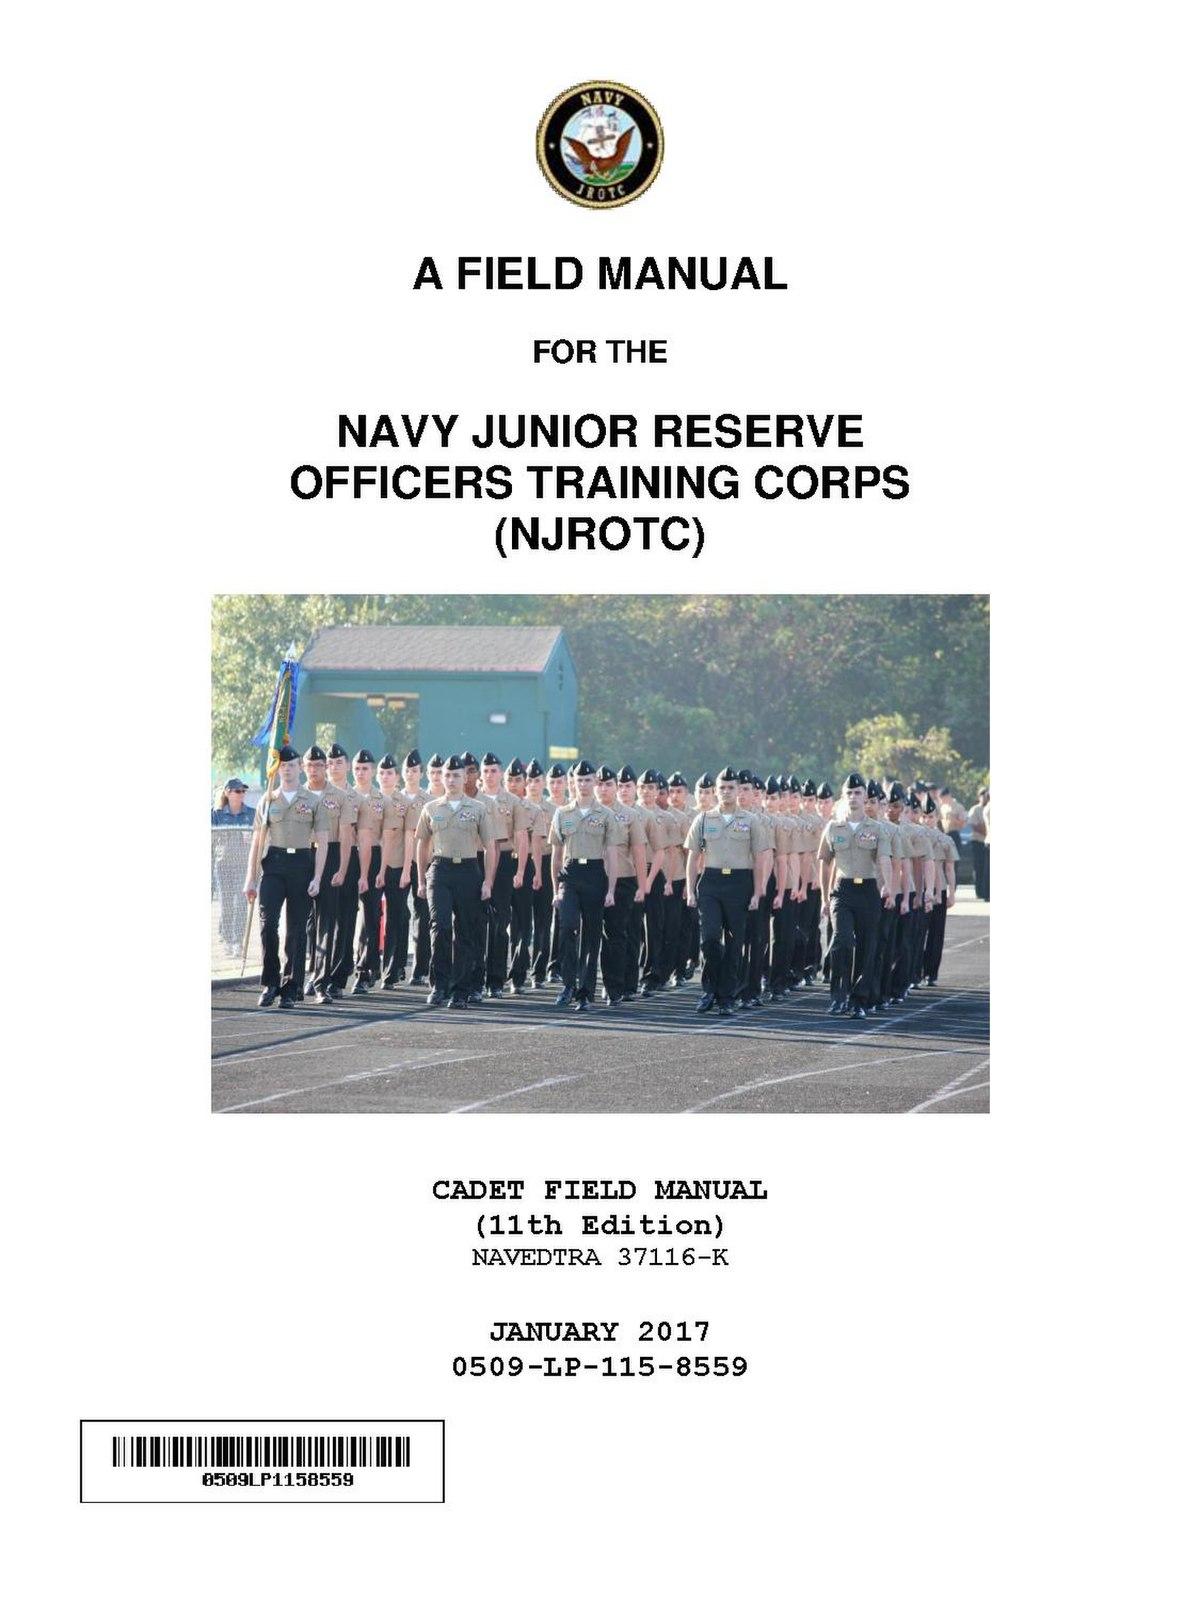 File:Cadet Field Manual 11th ED 2017.pdf - Wikimedia Commons